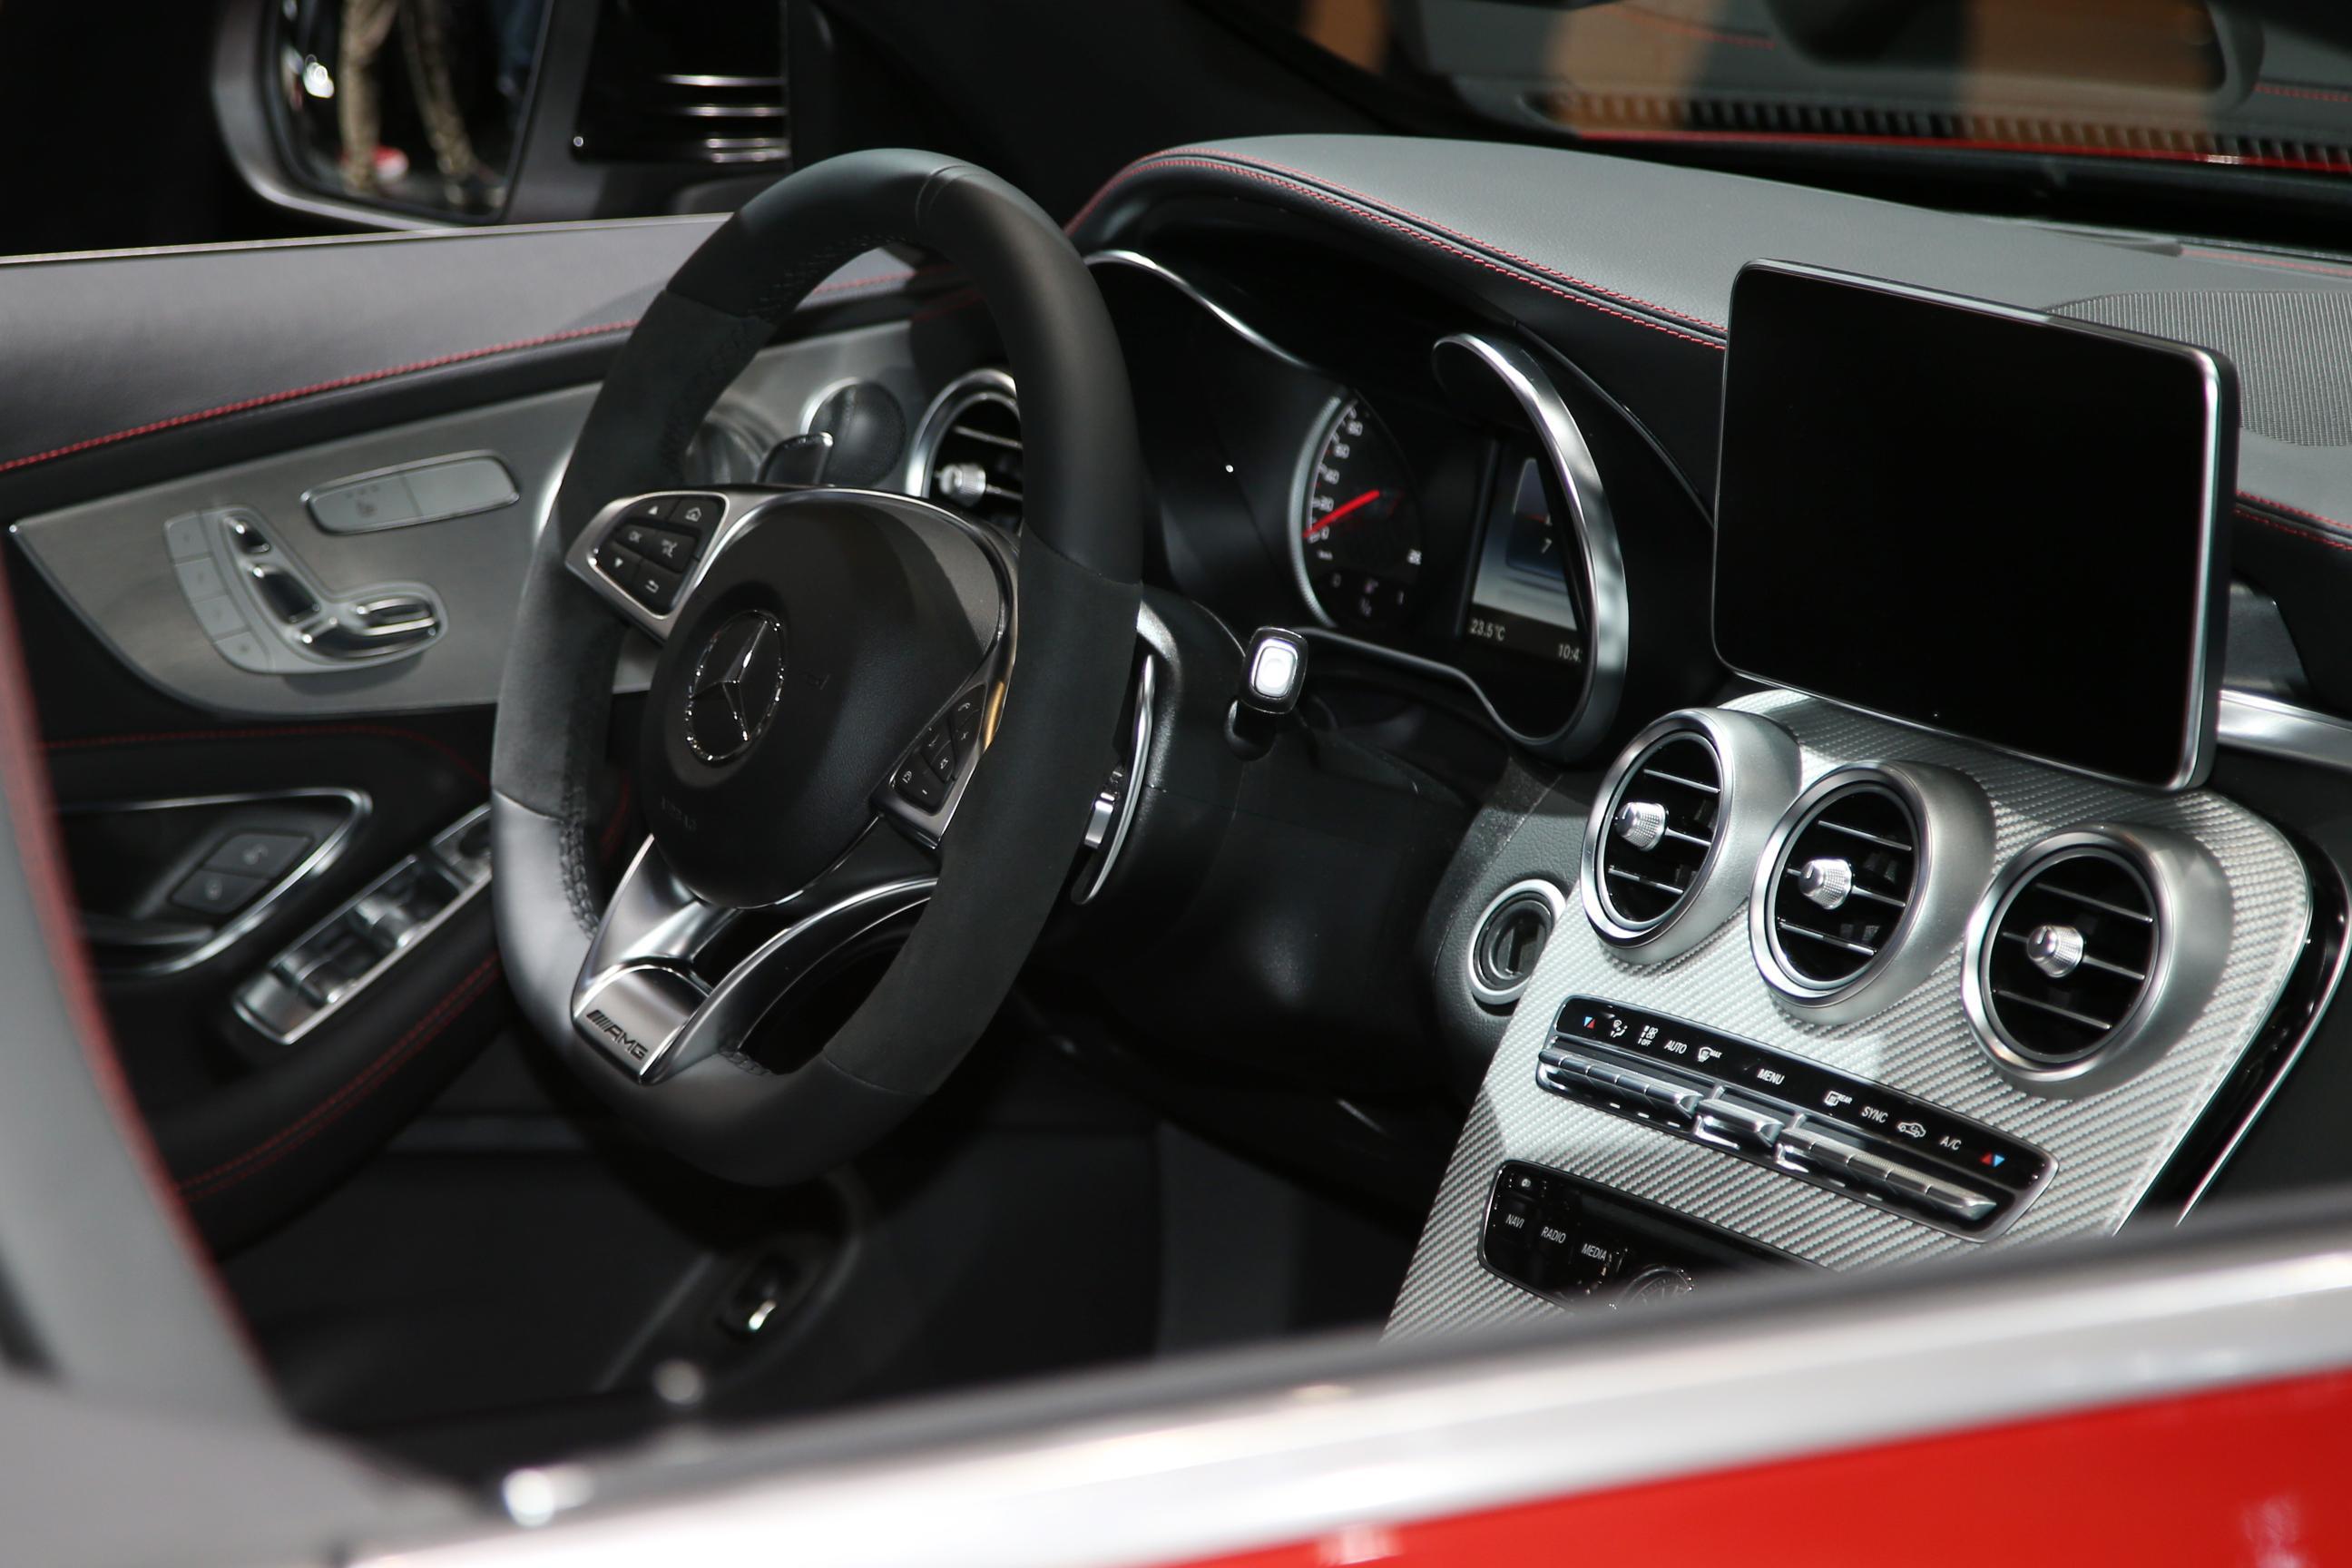 Mercedes-Benz C-Class Cabriolet 1